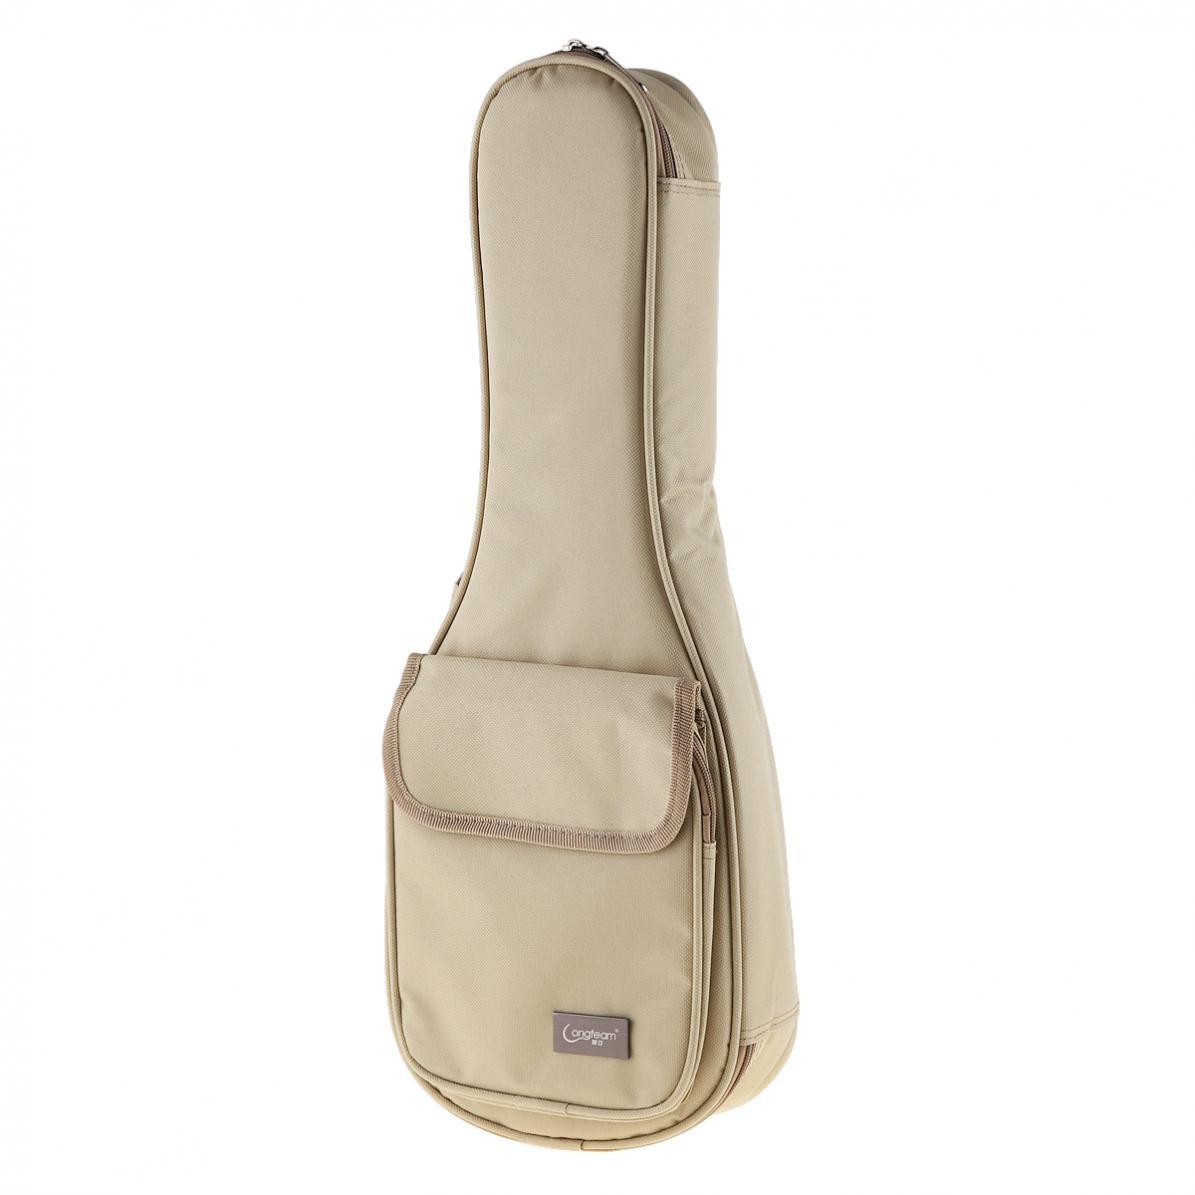 21 Inch 600D Oxford face Material Concise Khaki Ukulele Bag 15mm Sponge Soft Case Gig Stereoscopic Ukelele Mini Guitar Backpack